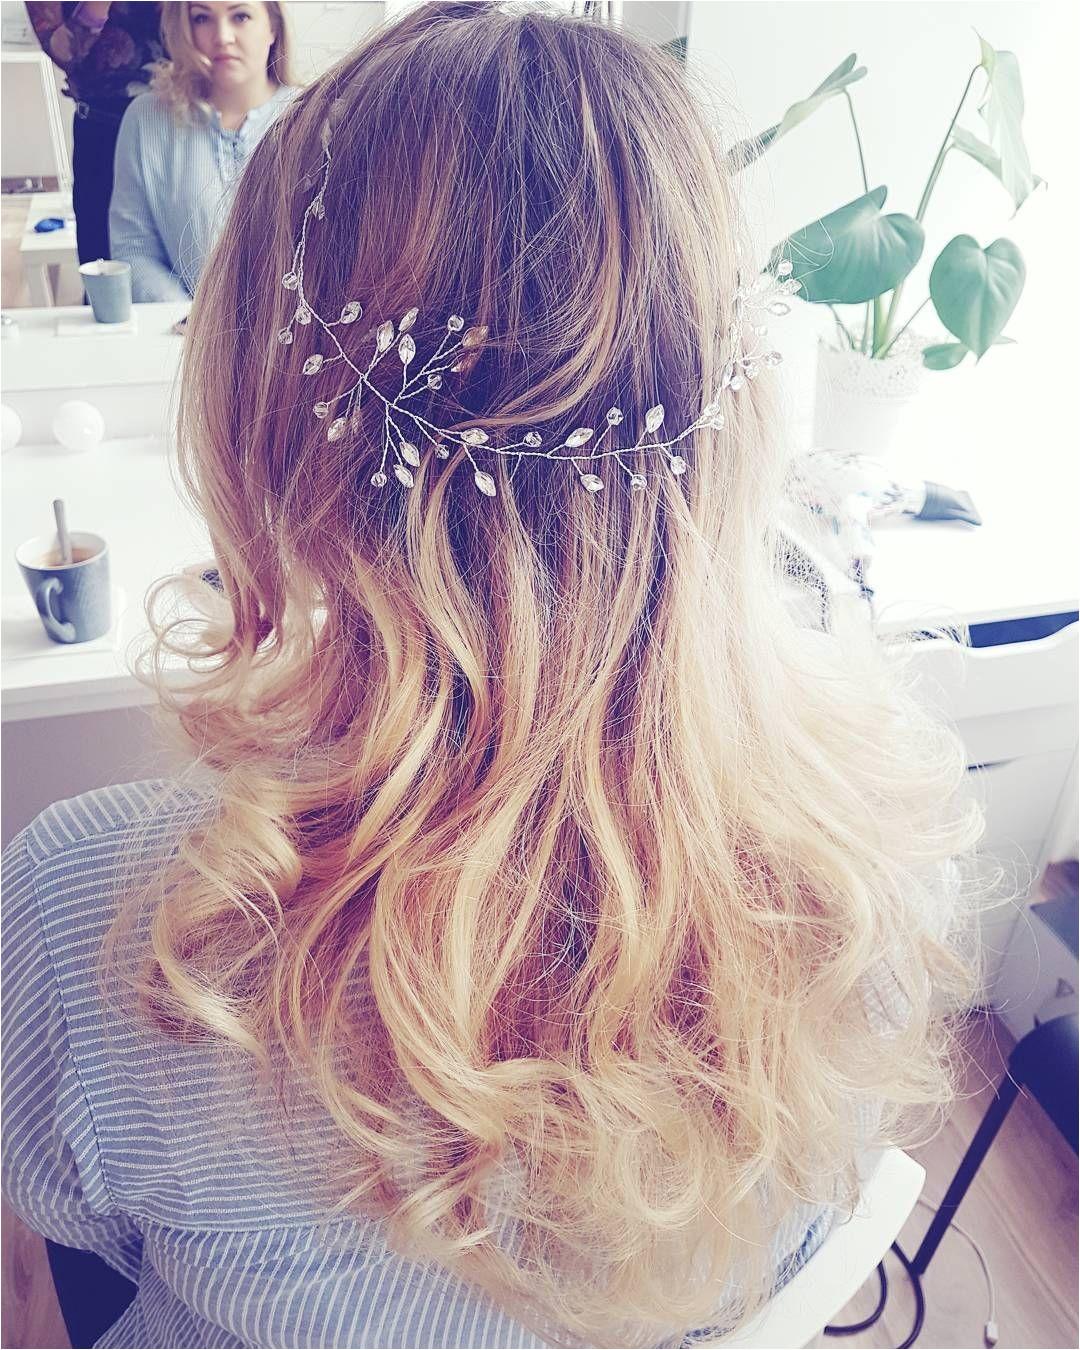 Hair Color Stylist Elegant Takie Cudowno…